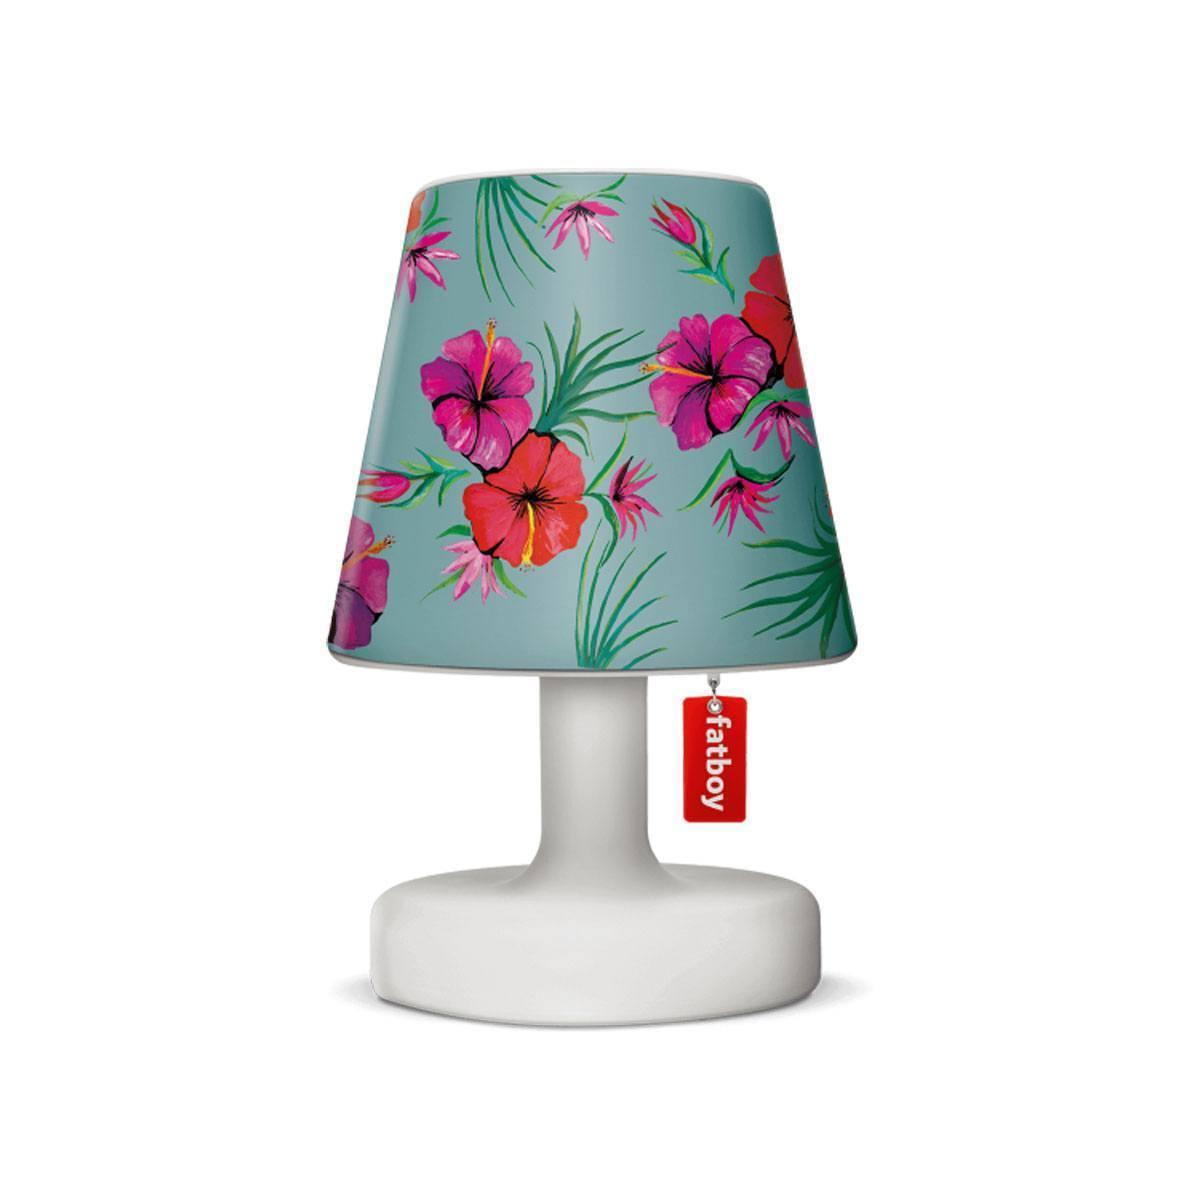 cooper cappie hawaii blue van fatboy fleurige bloemenprint rood rose. Black Bedroom Furniture Sets. Home Design Ideas